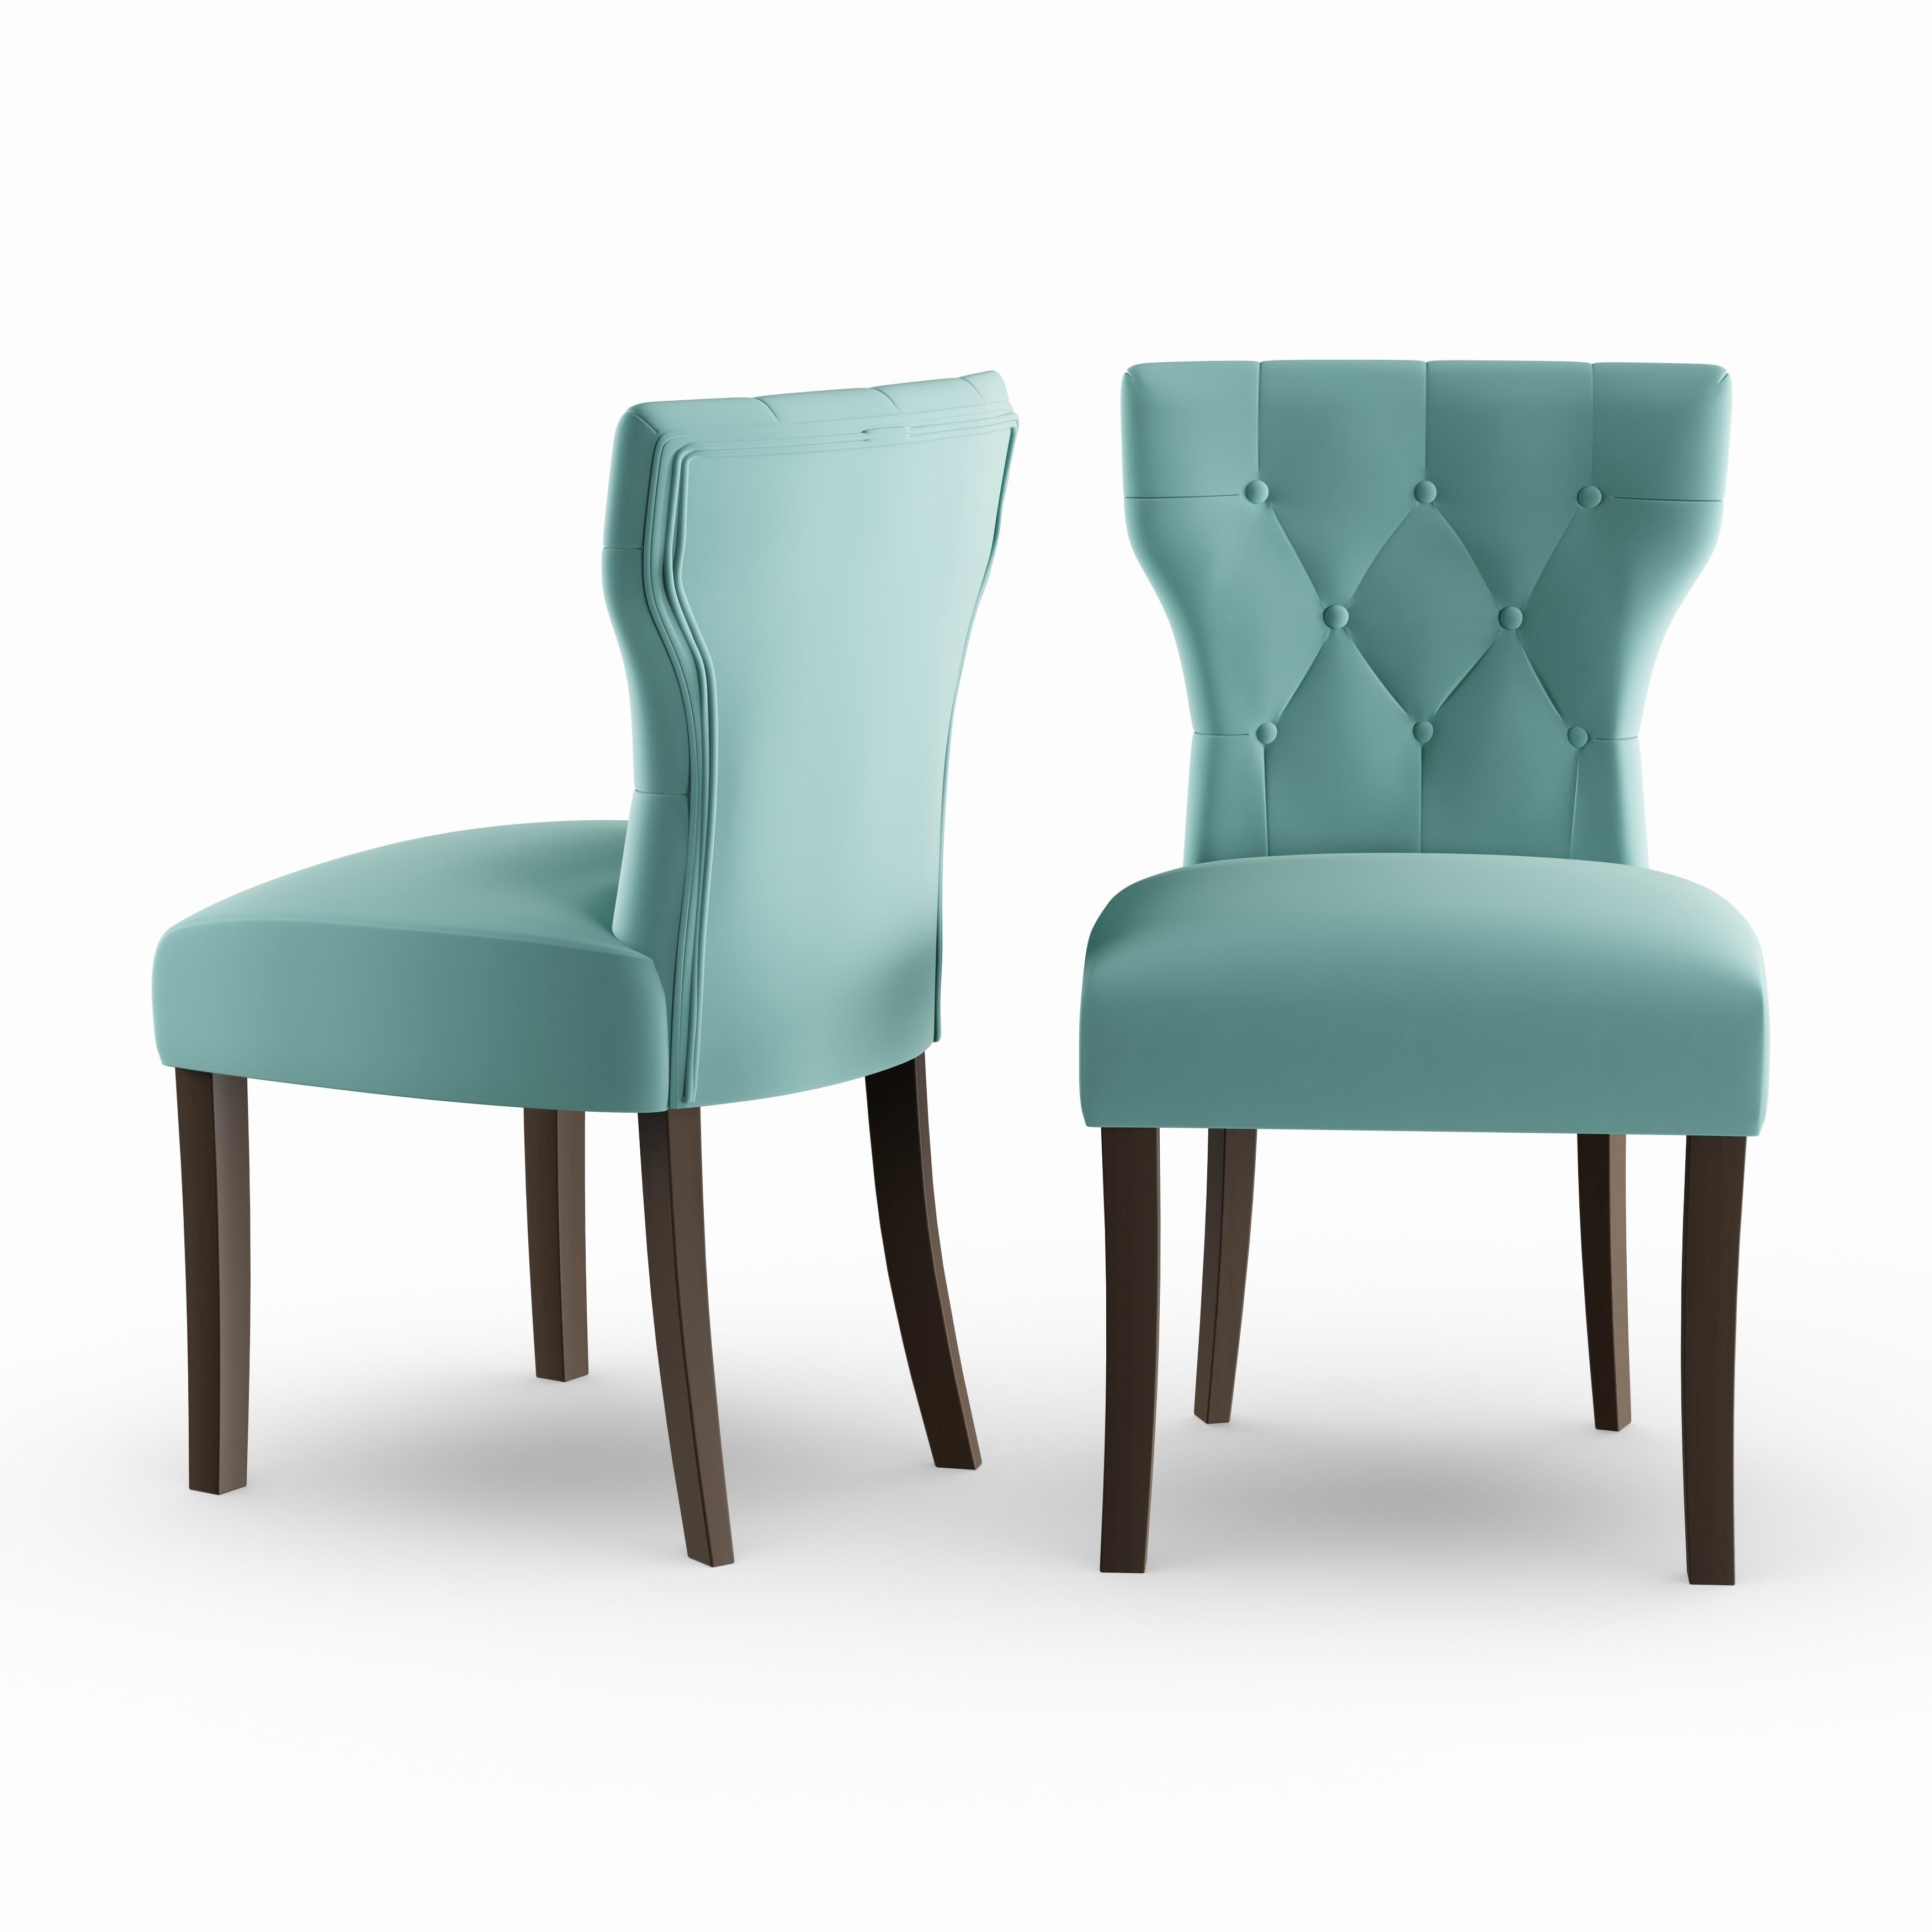 Copper Grove Lagunas Deep Turquoise Blue Velvet Upholstered Armless Dining Chairs Set Of 2